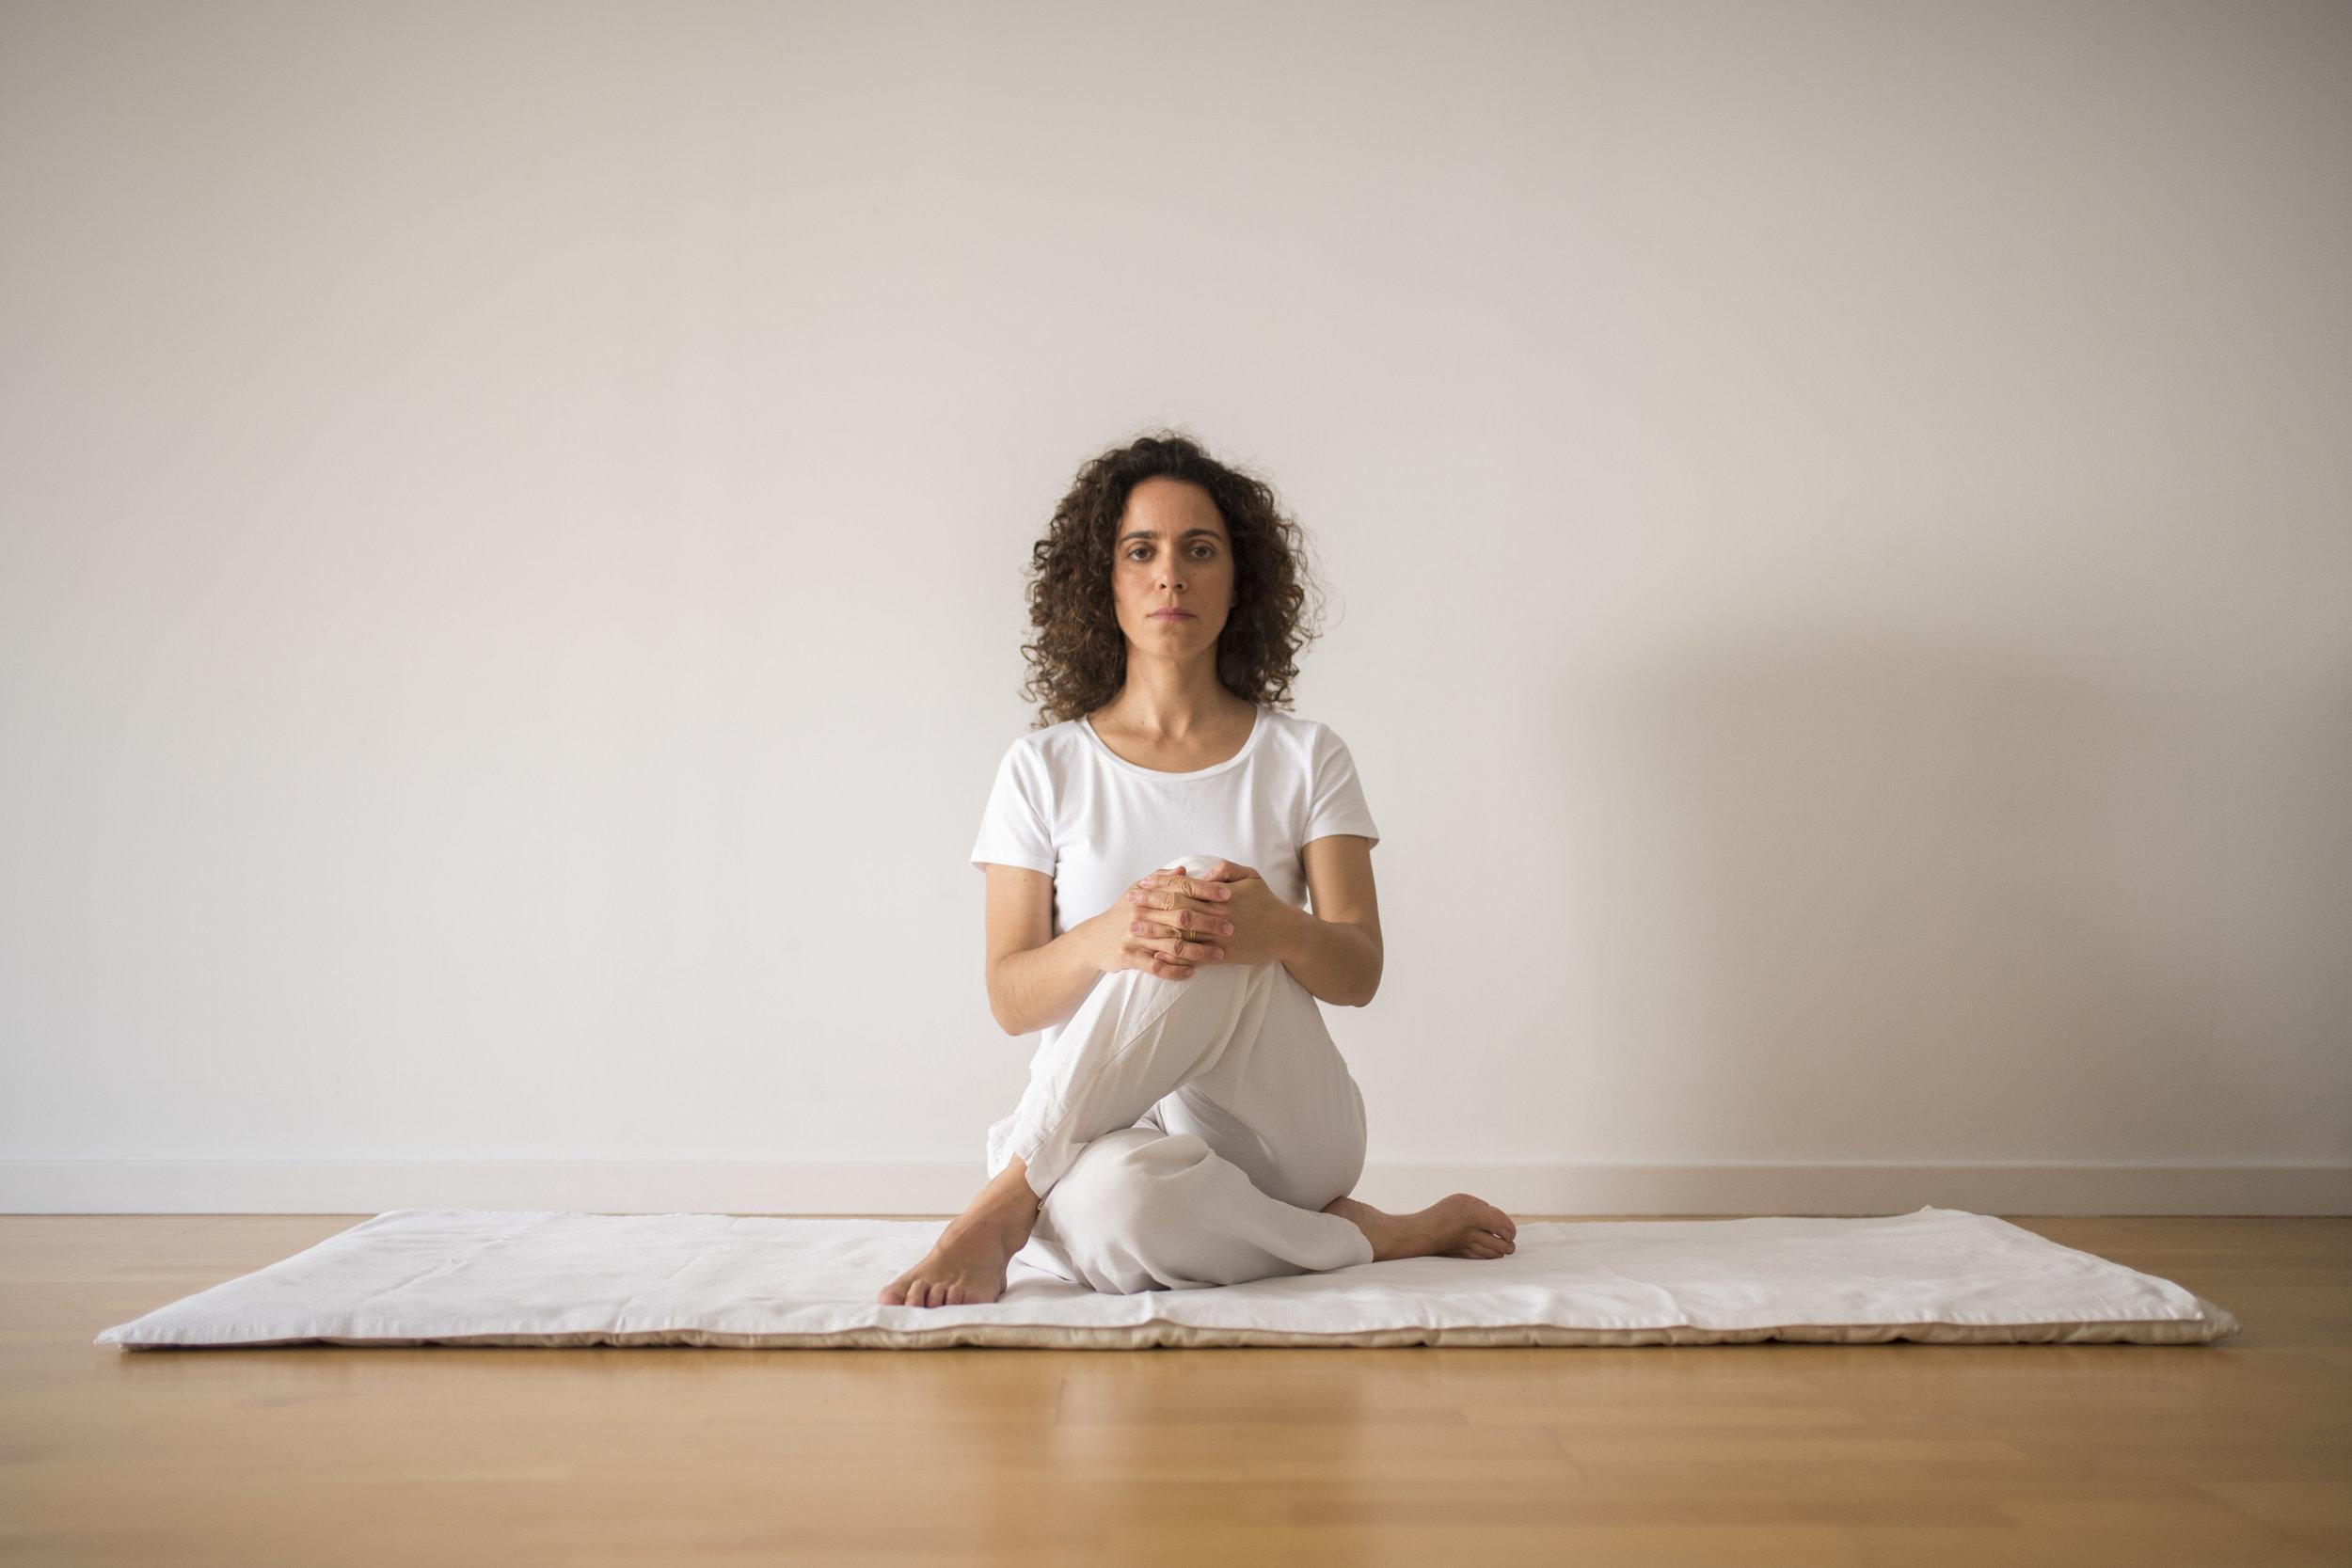 Nuria-Chalamanch_yoga_2018-06-01_gilbertbages_73.JPG